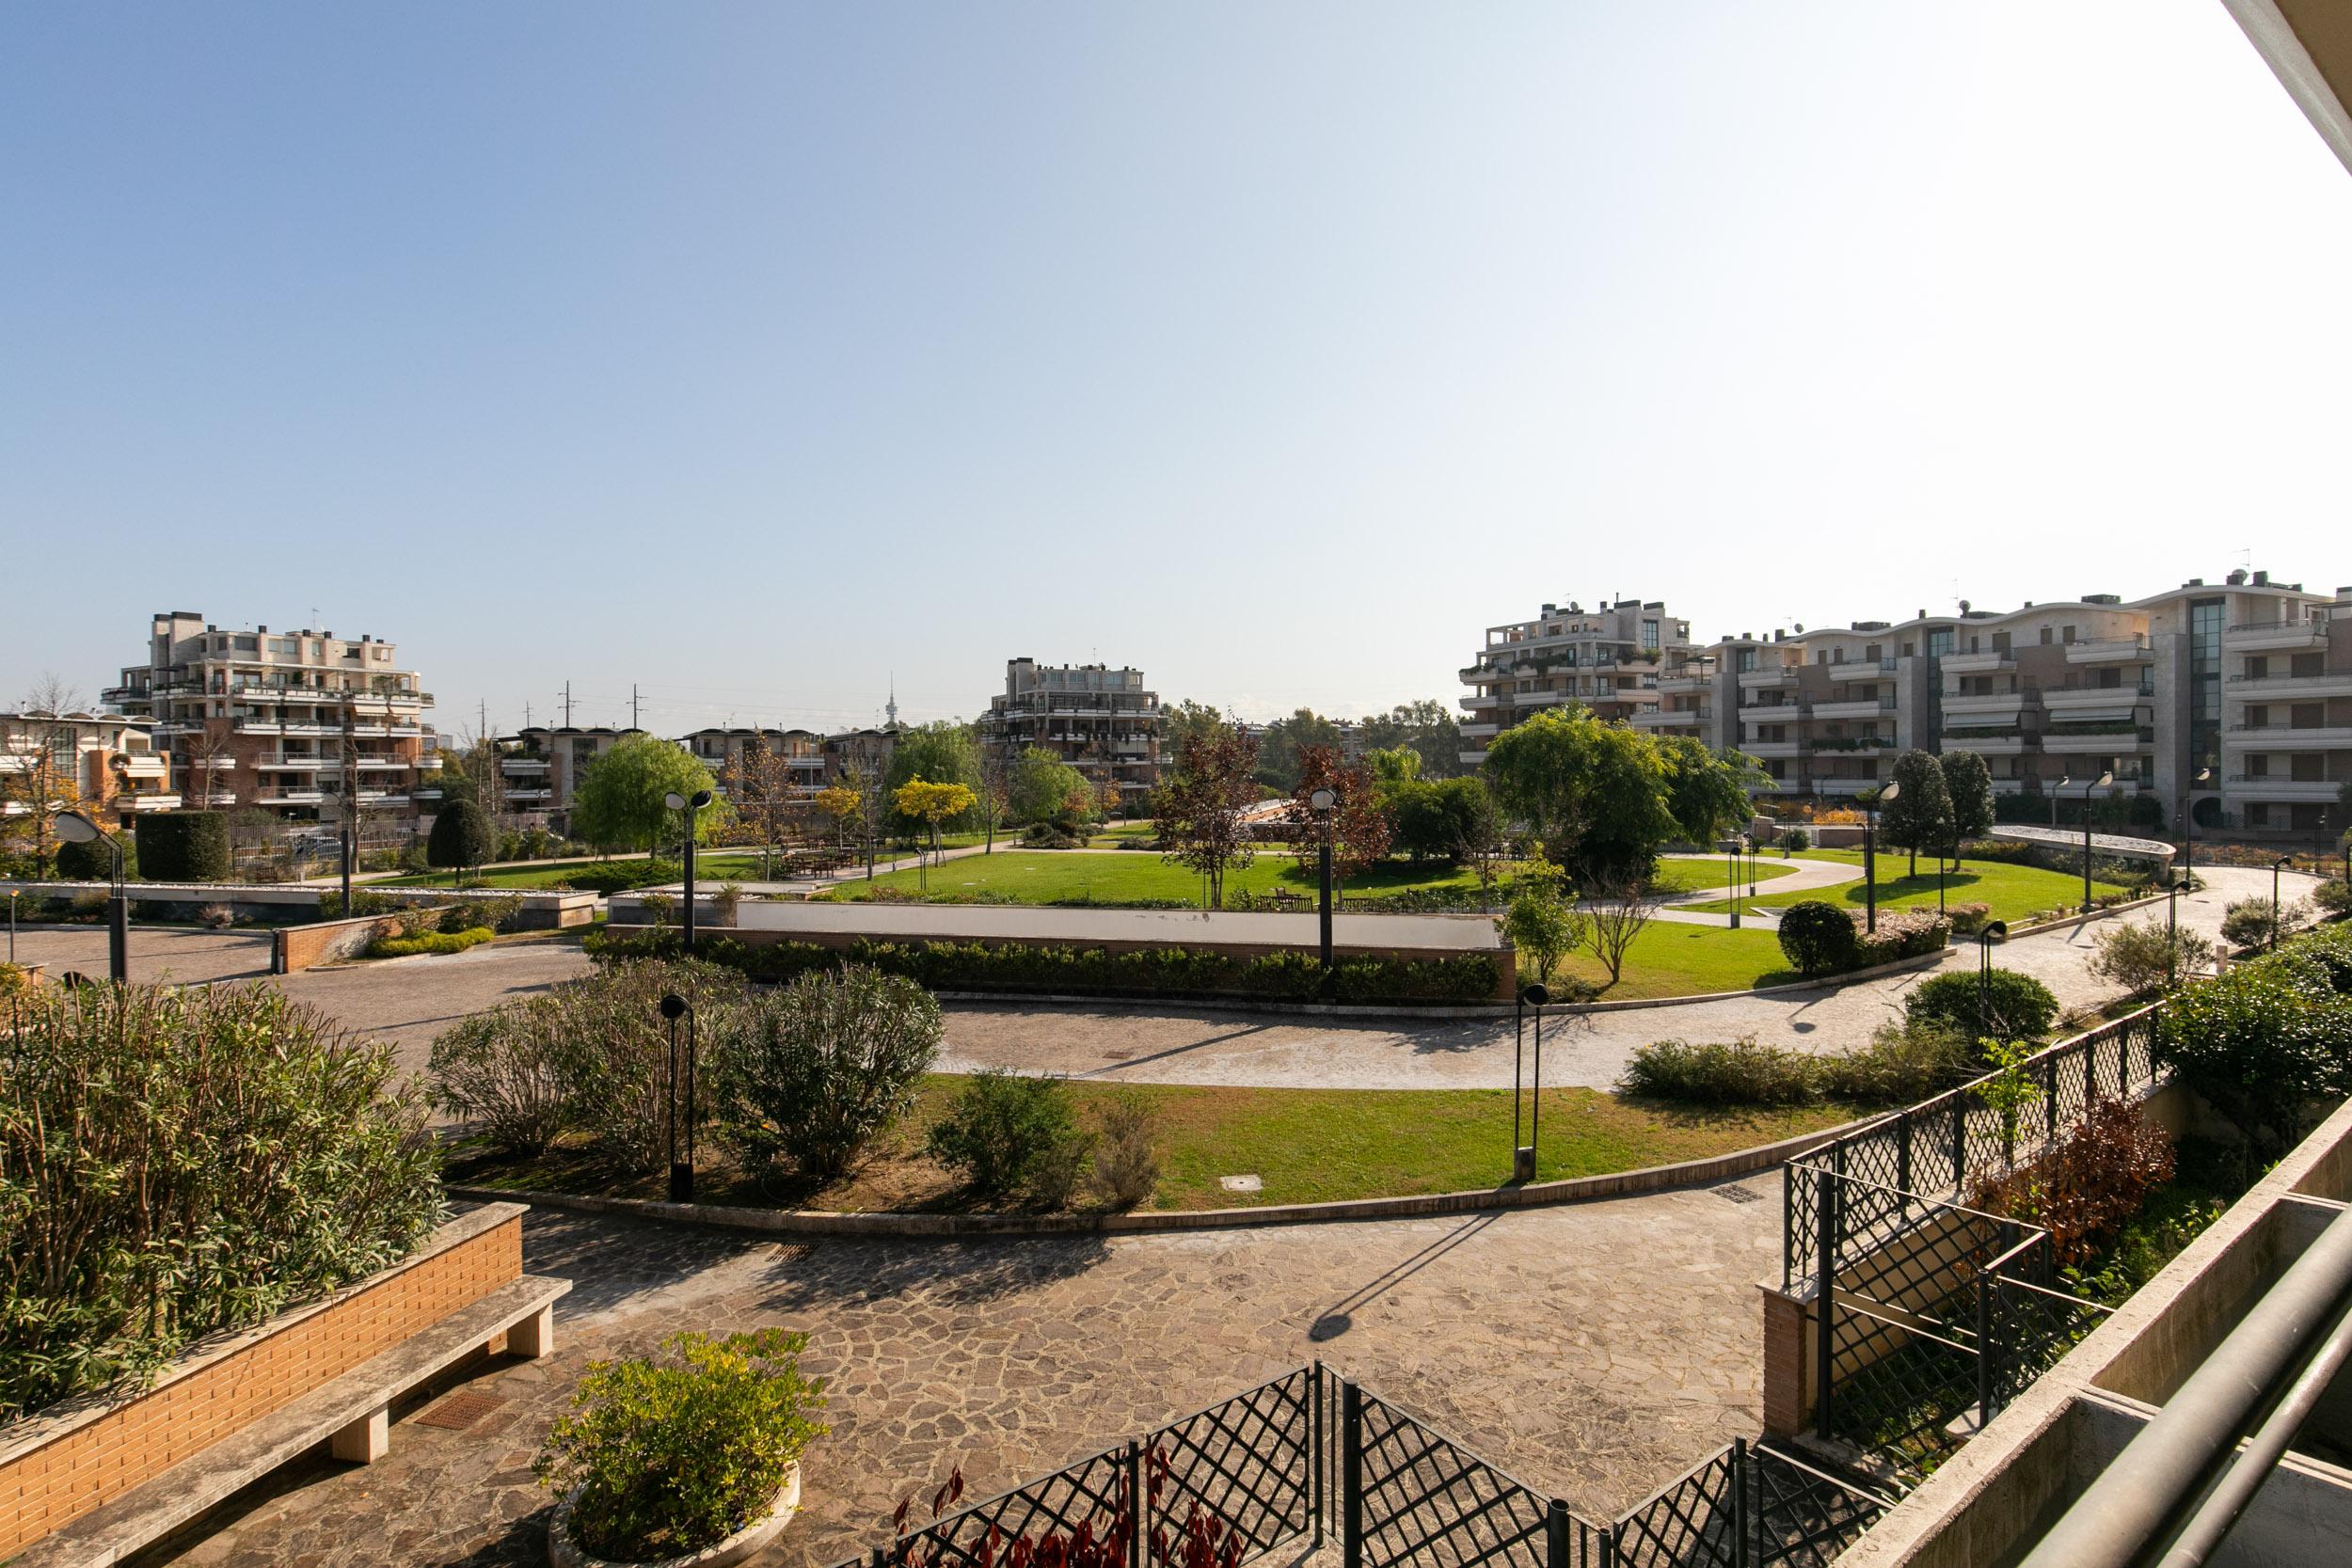 Fonte-Giardino-Esterno-Parco-2